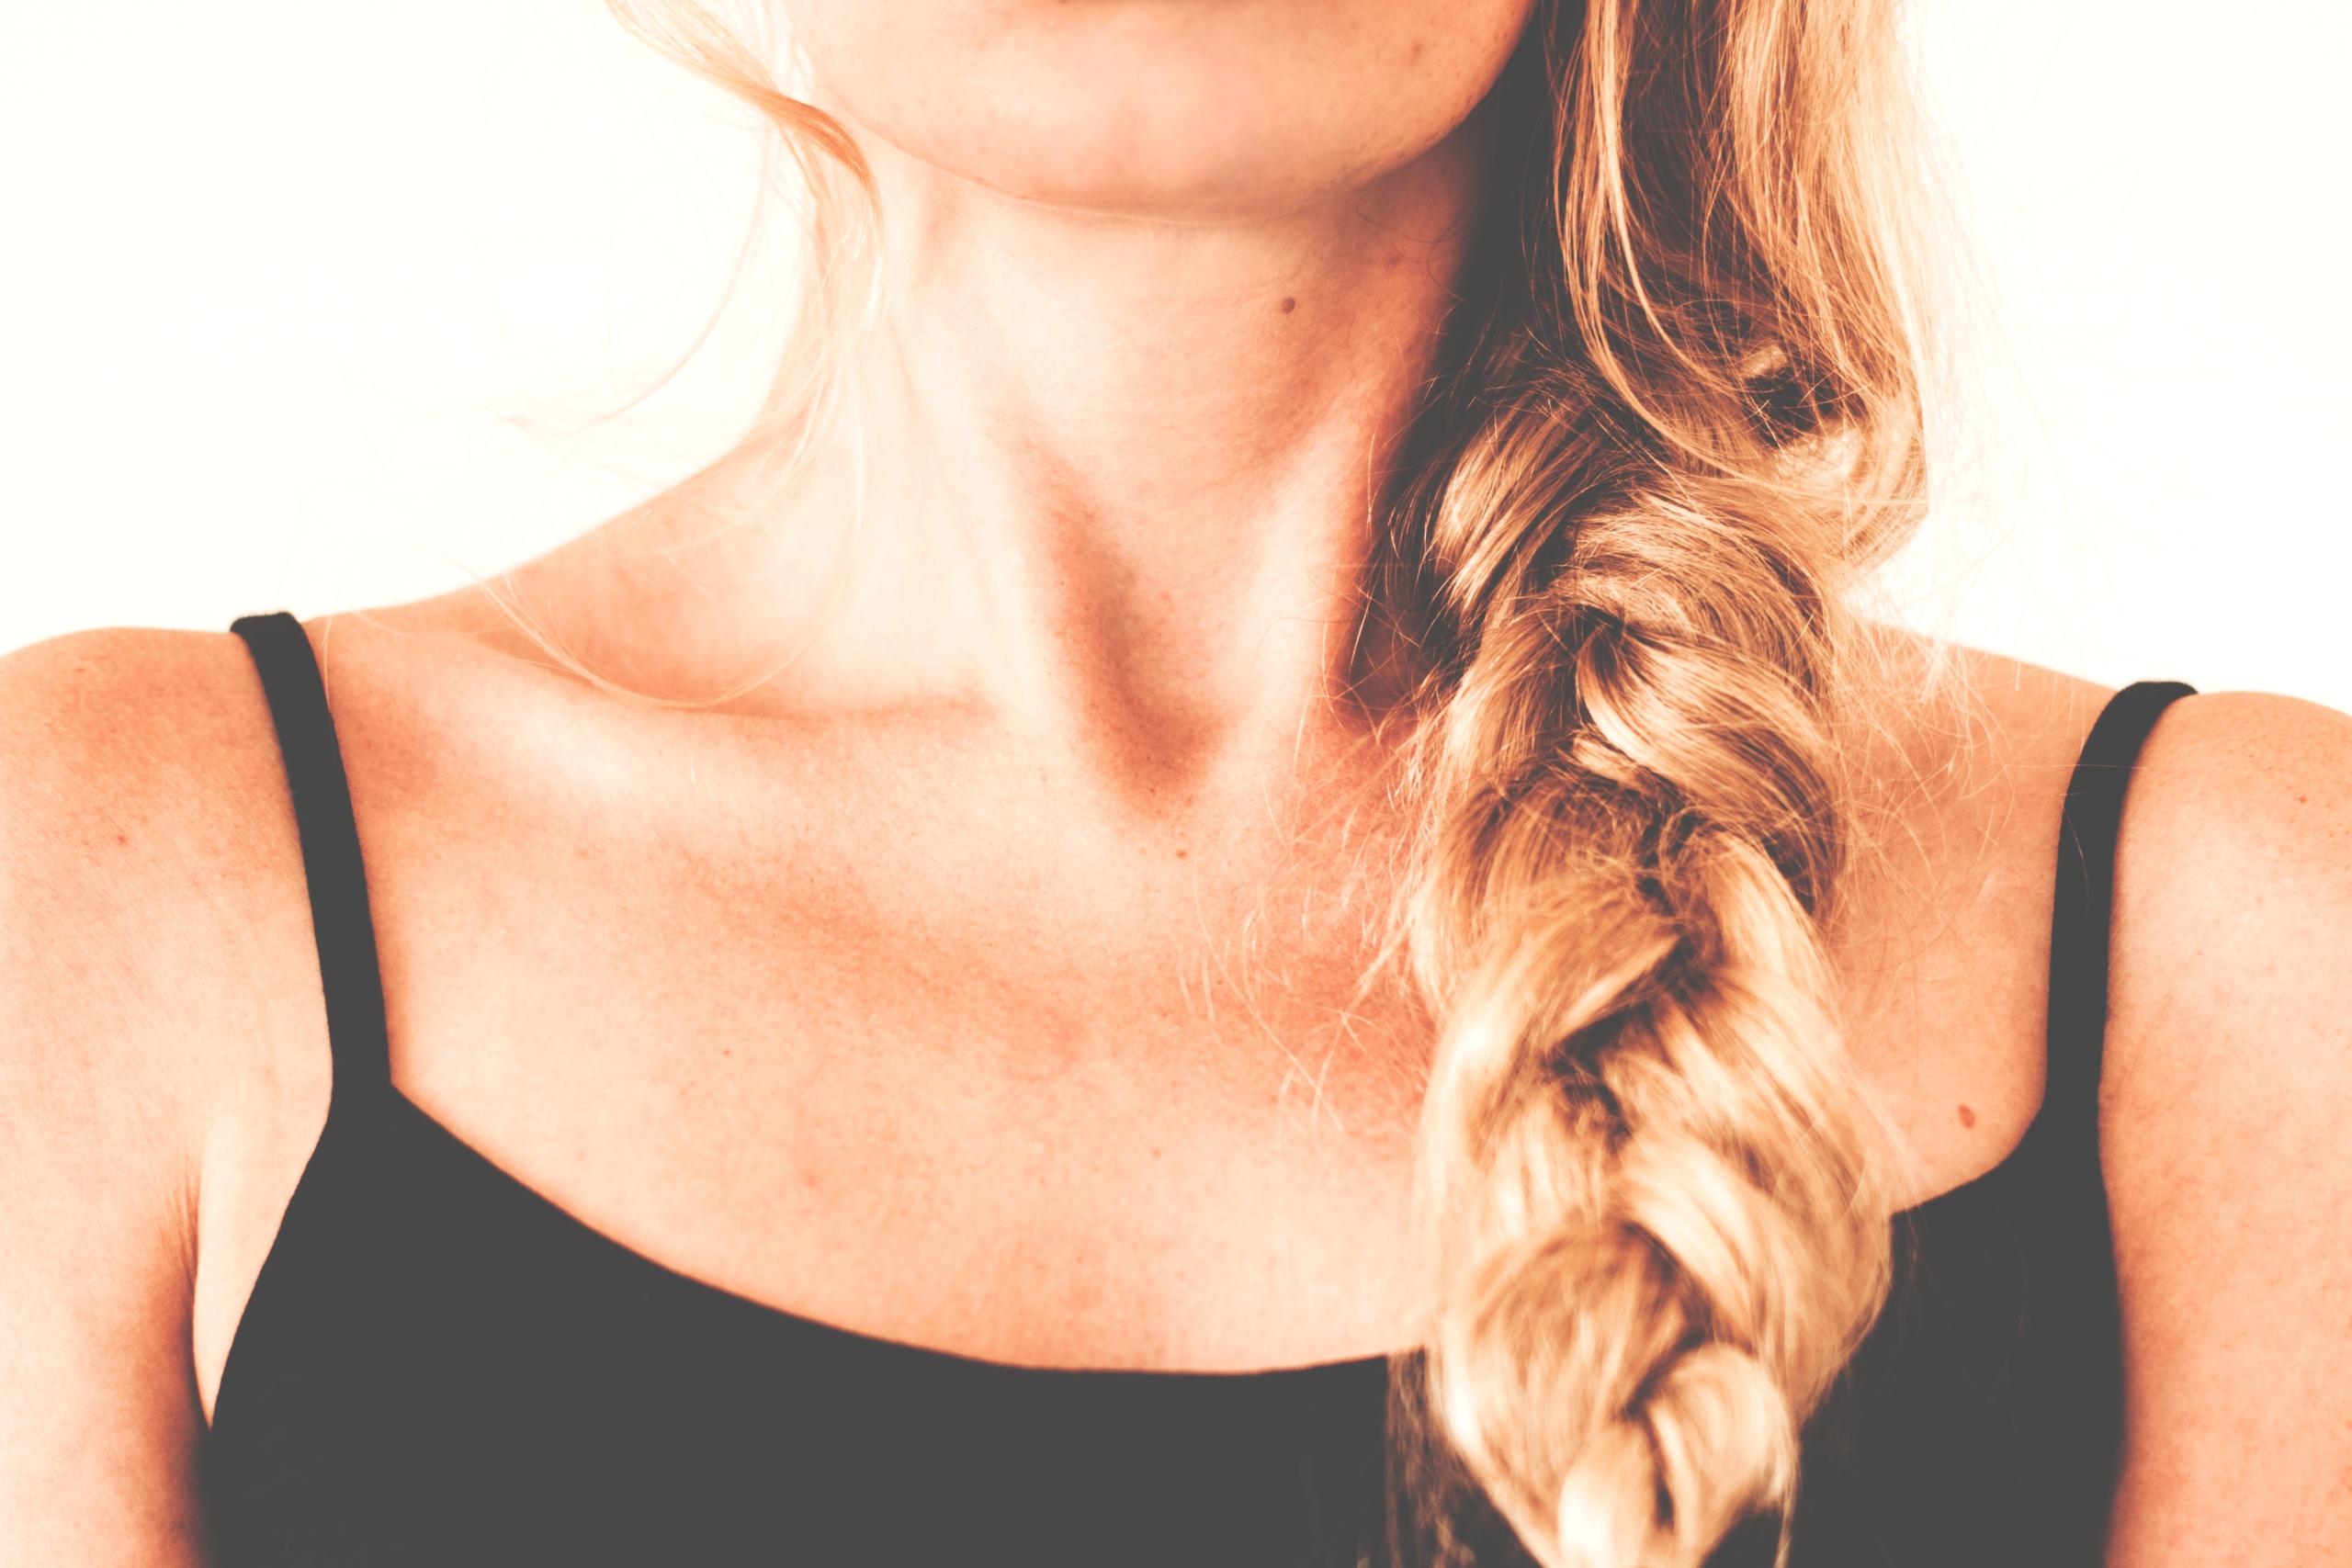 Tolle Flechtfrisuren ohne Hilfe - Haare flechten leicht erklärt!